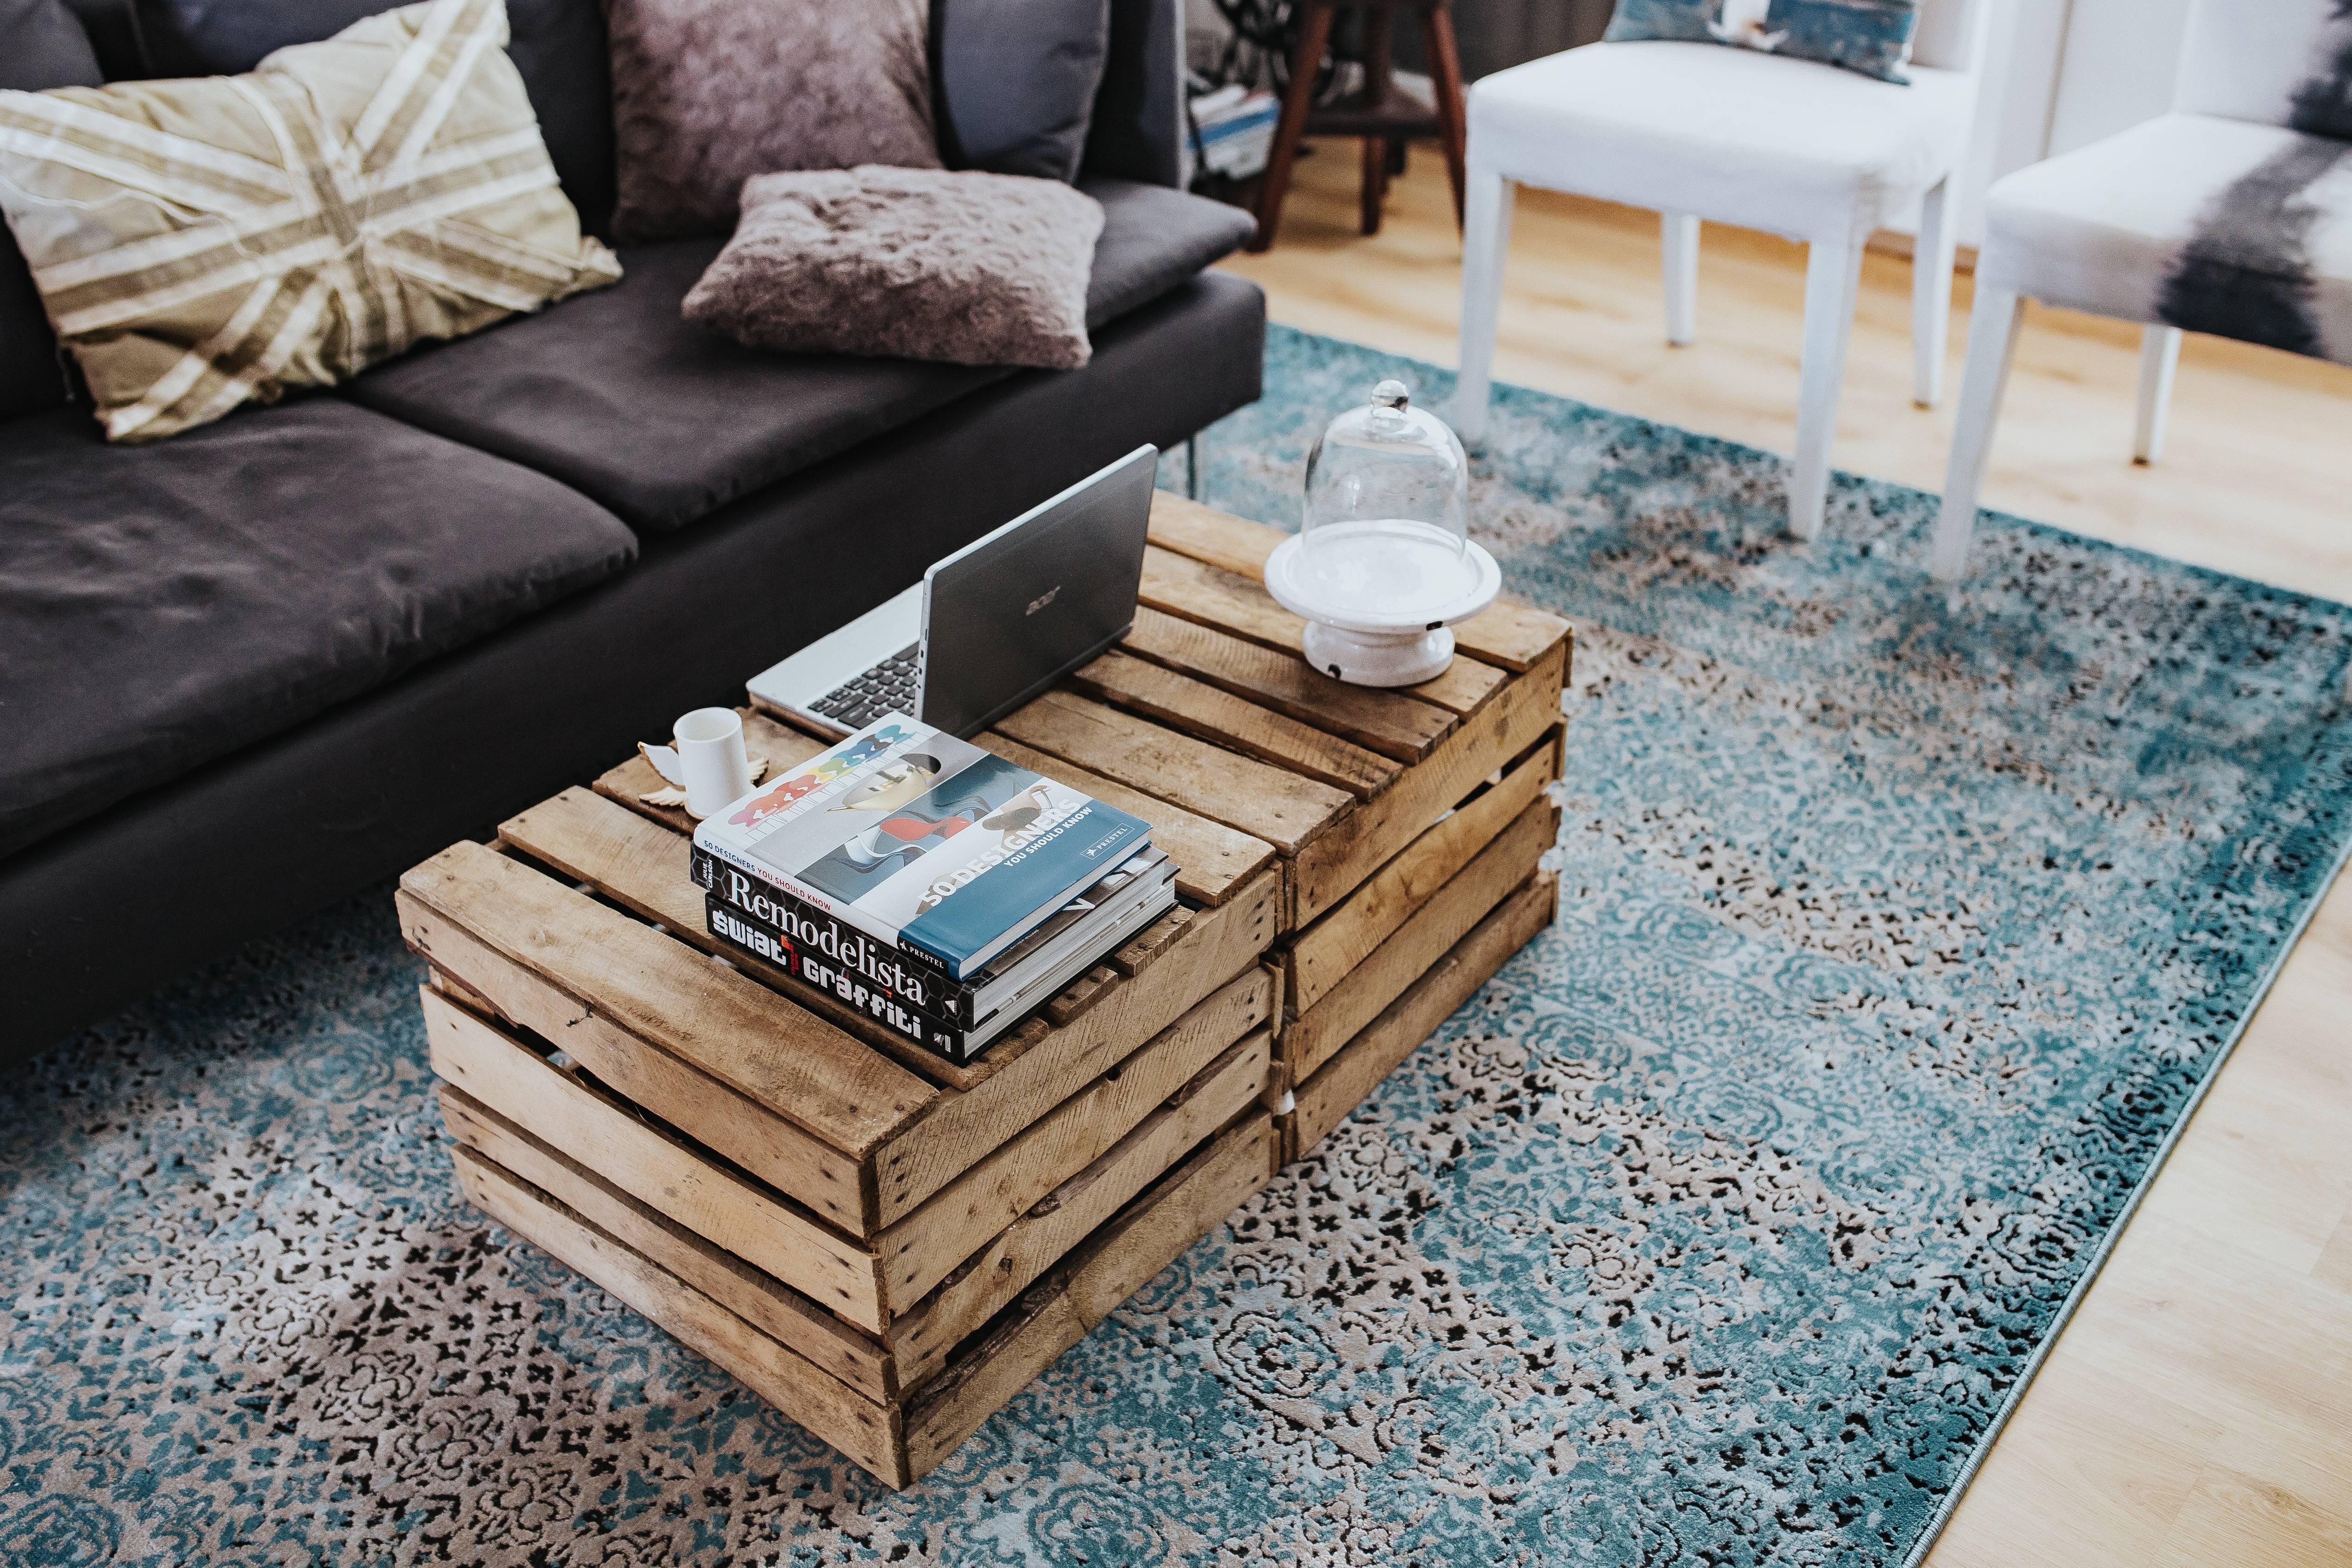 Free stock photos of interiors, home decor - Kaboompics